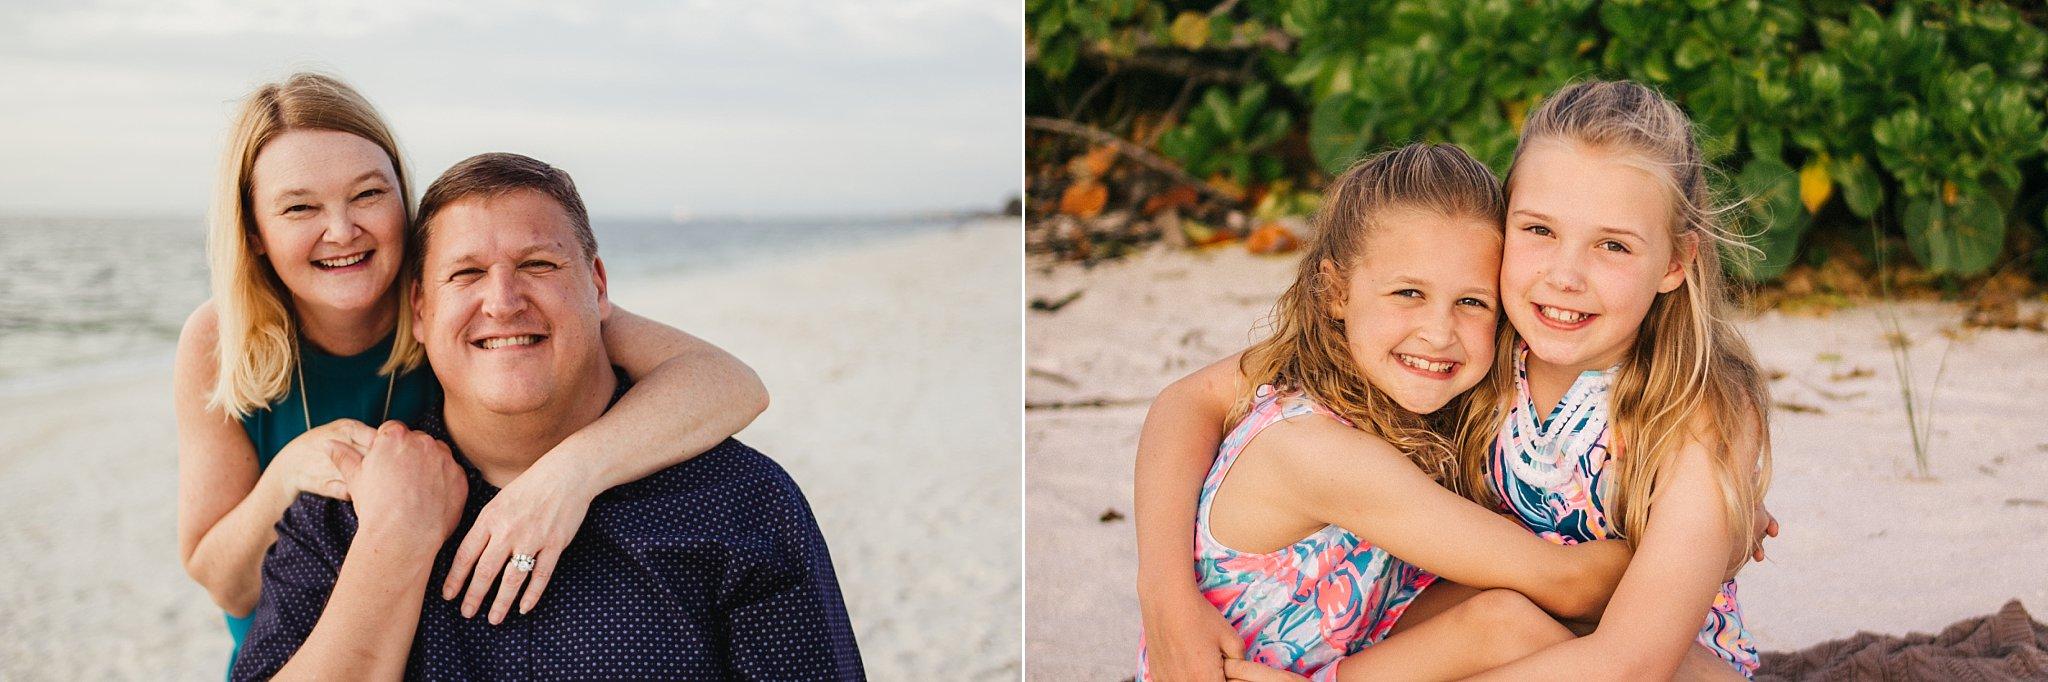 Bonita Beach Family Photography Lee County Florida